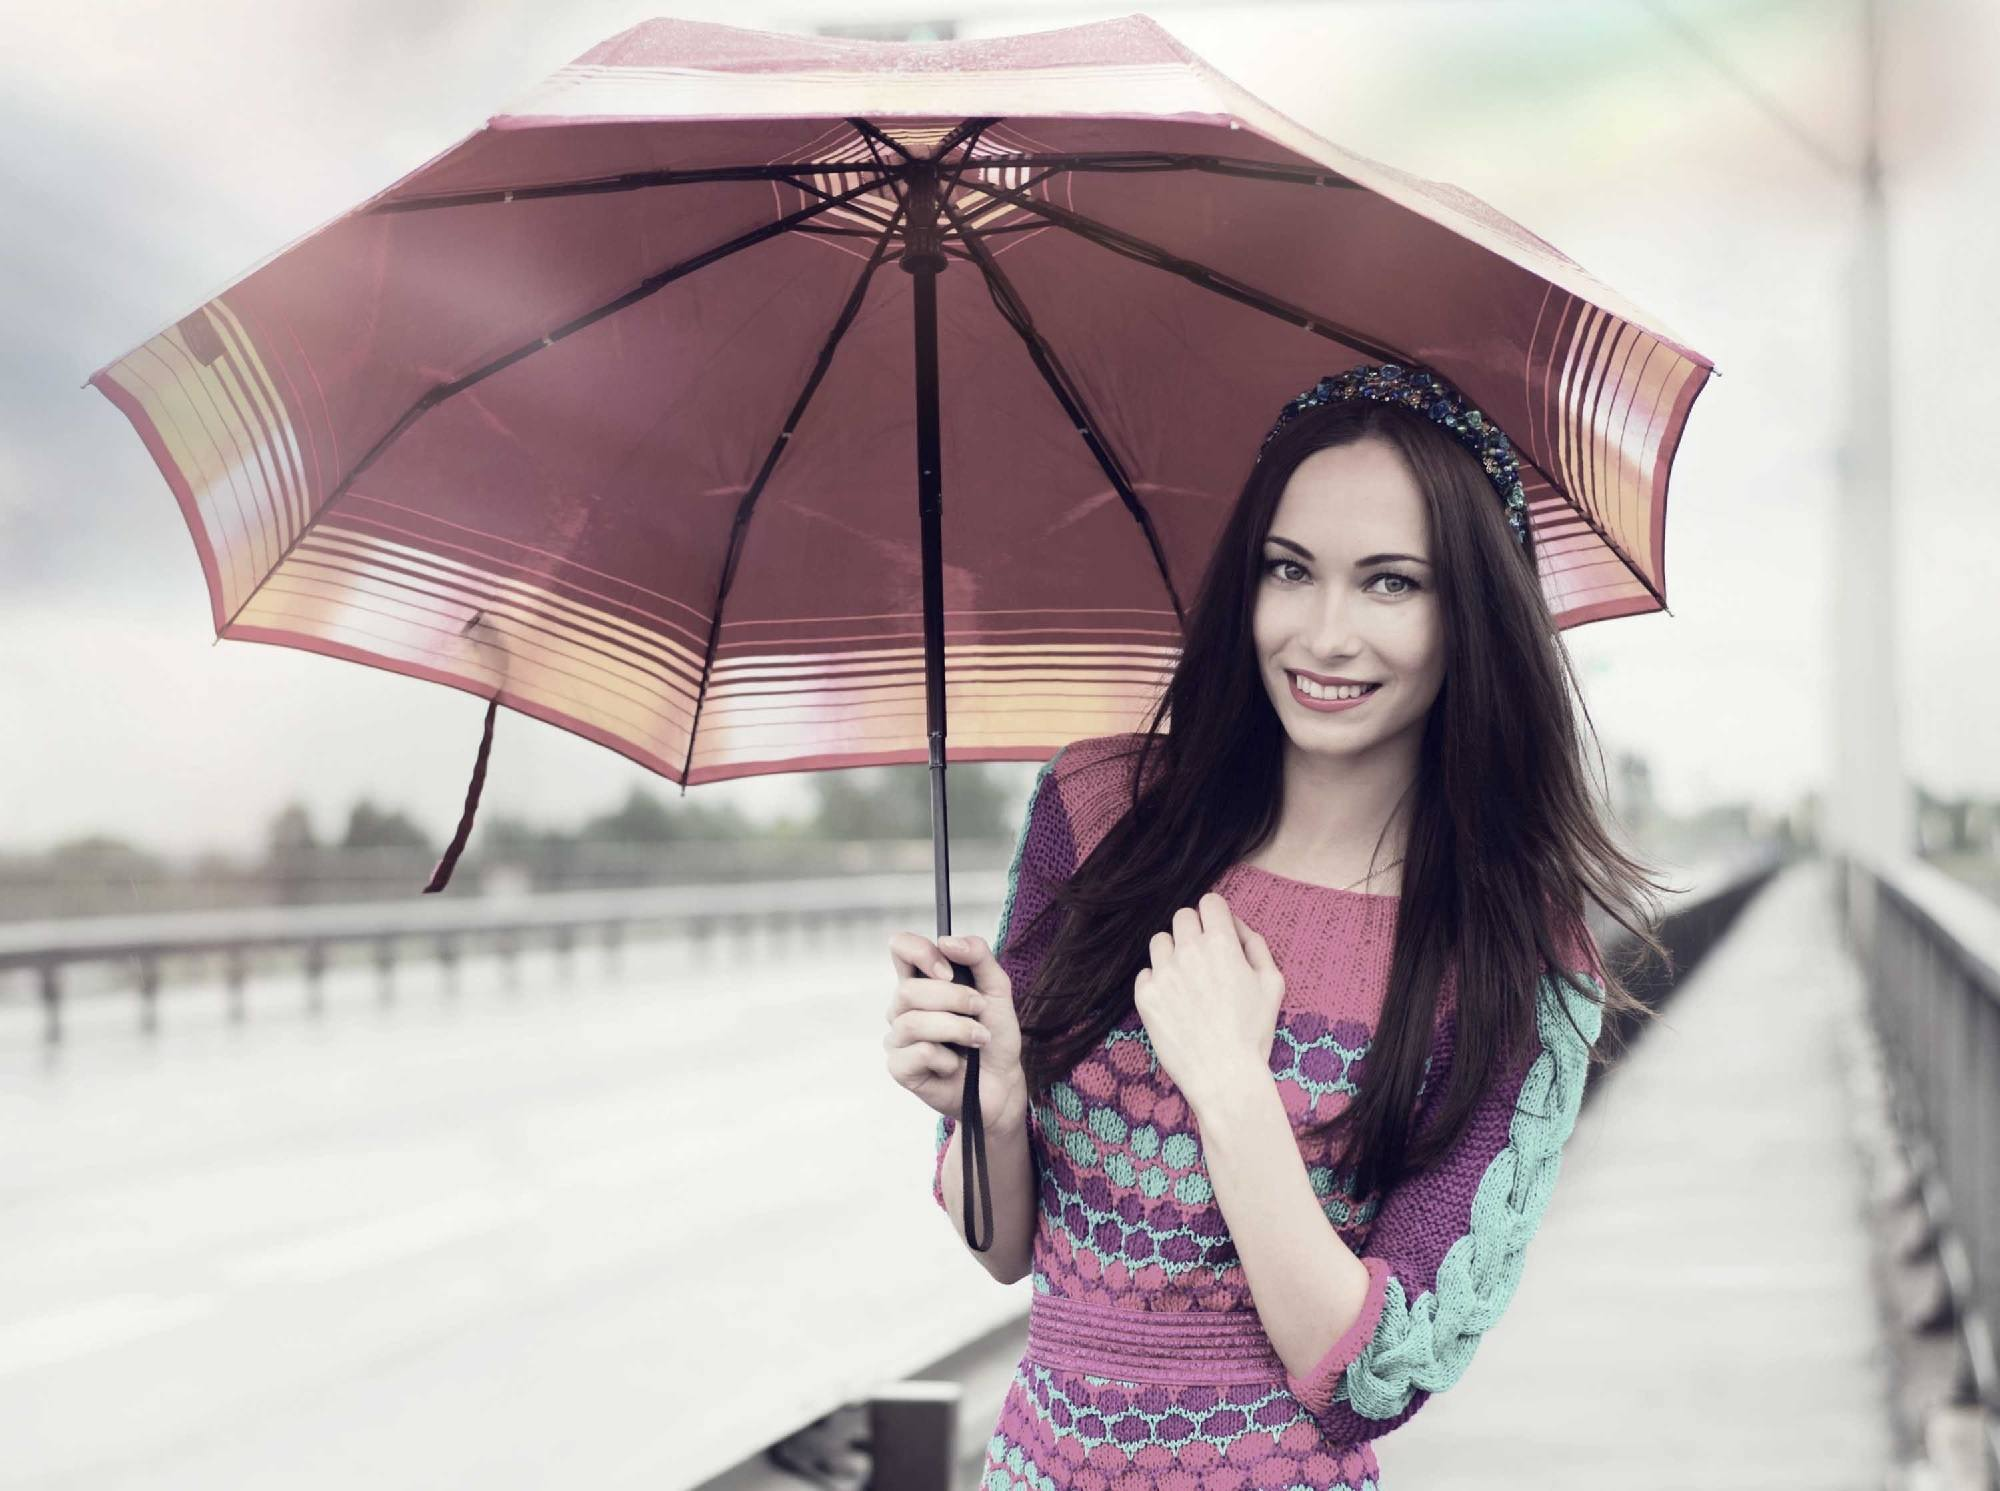 Rainy day hairstyles - Straight up